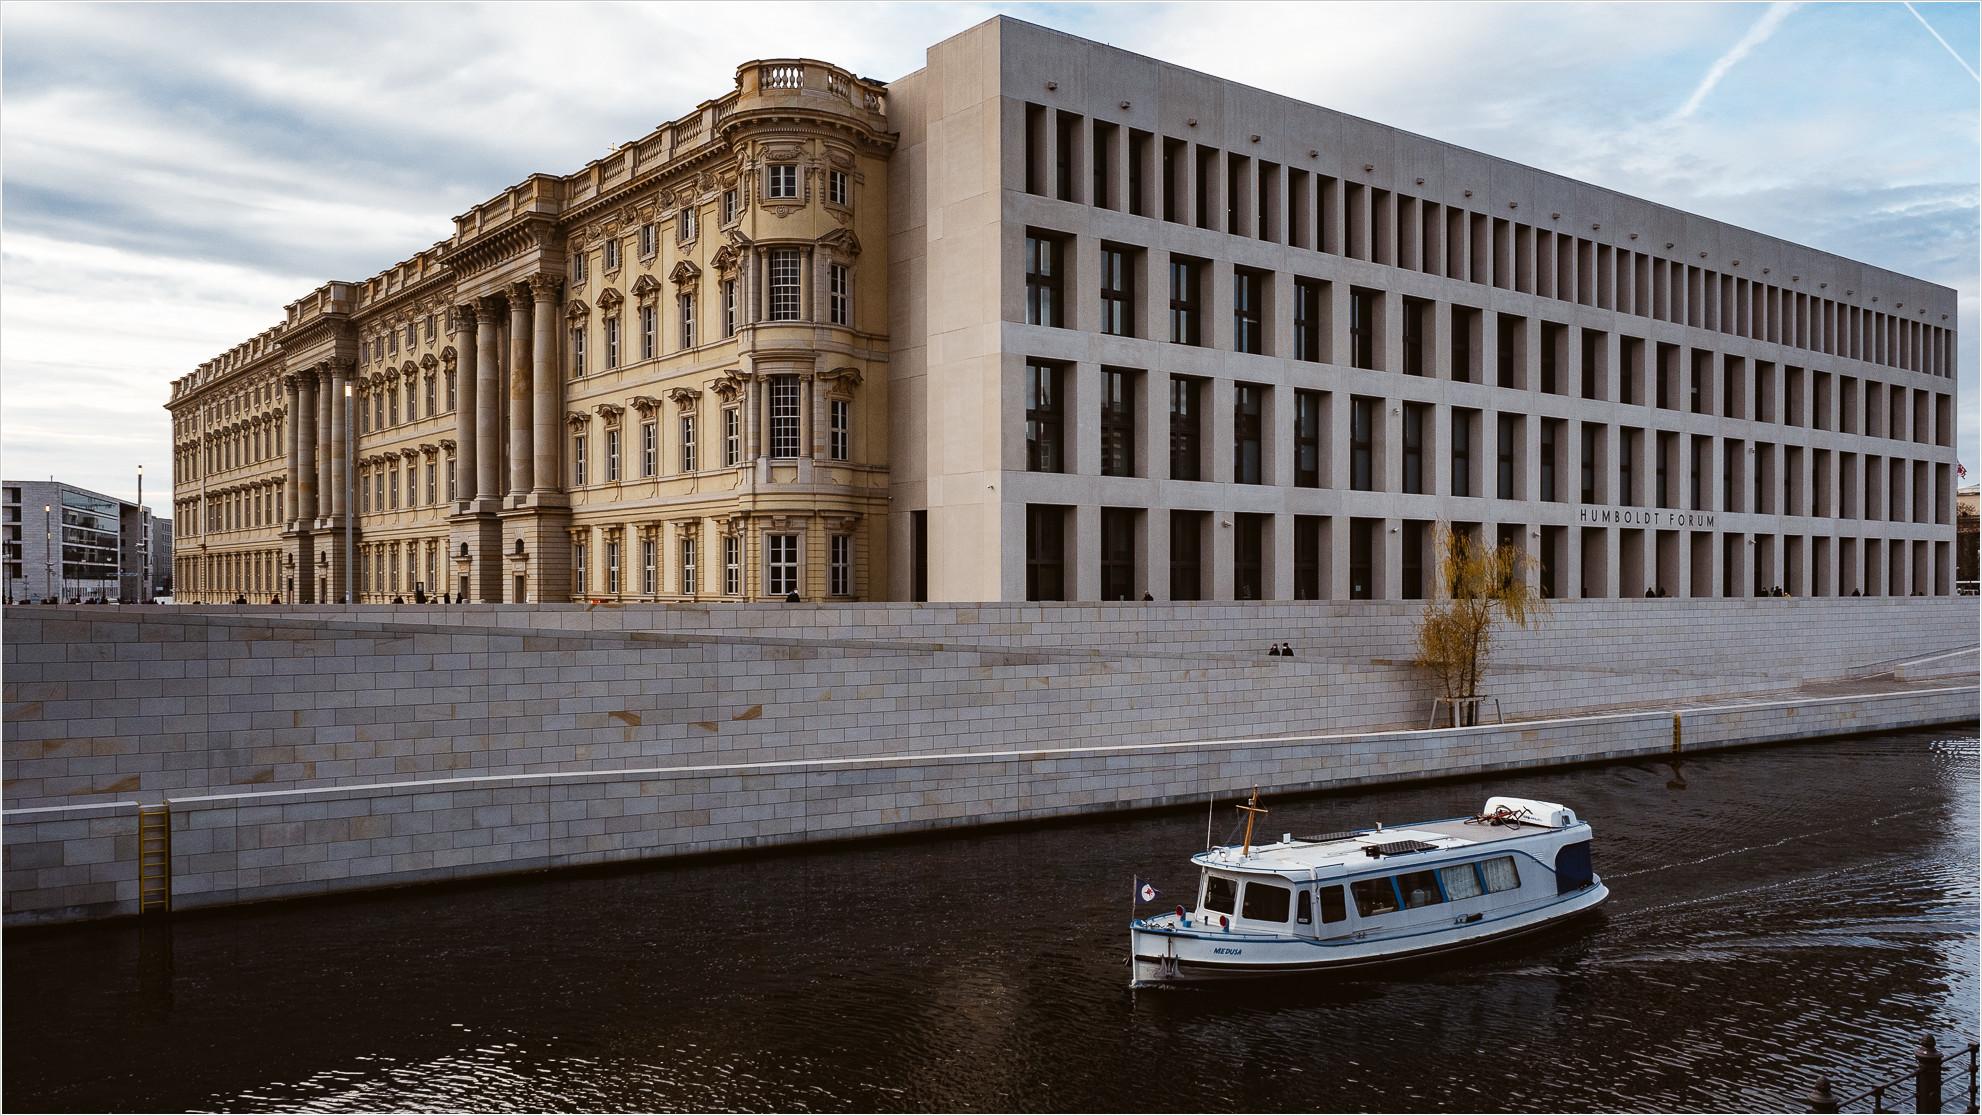 Humboldtforum Berlin - Spreeseite